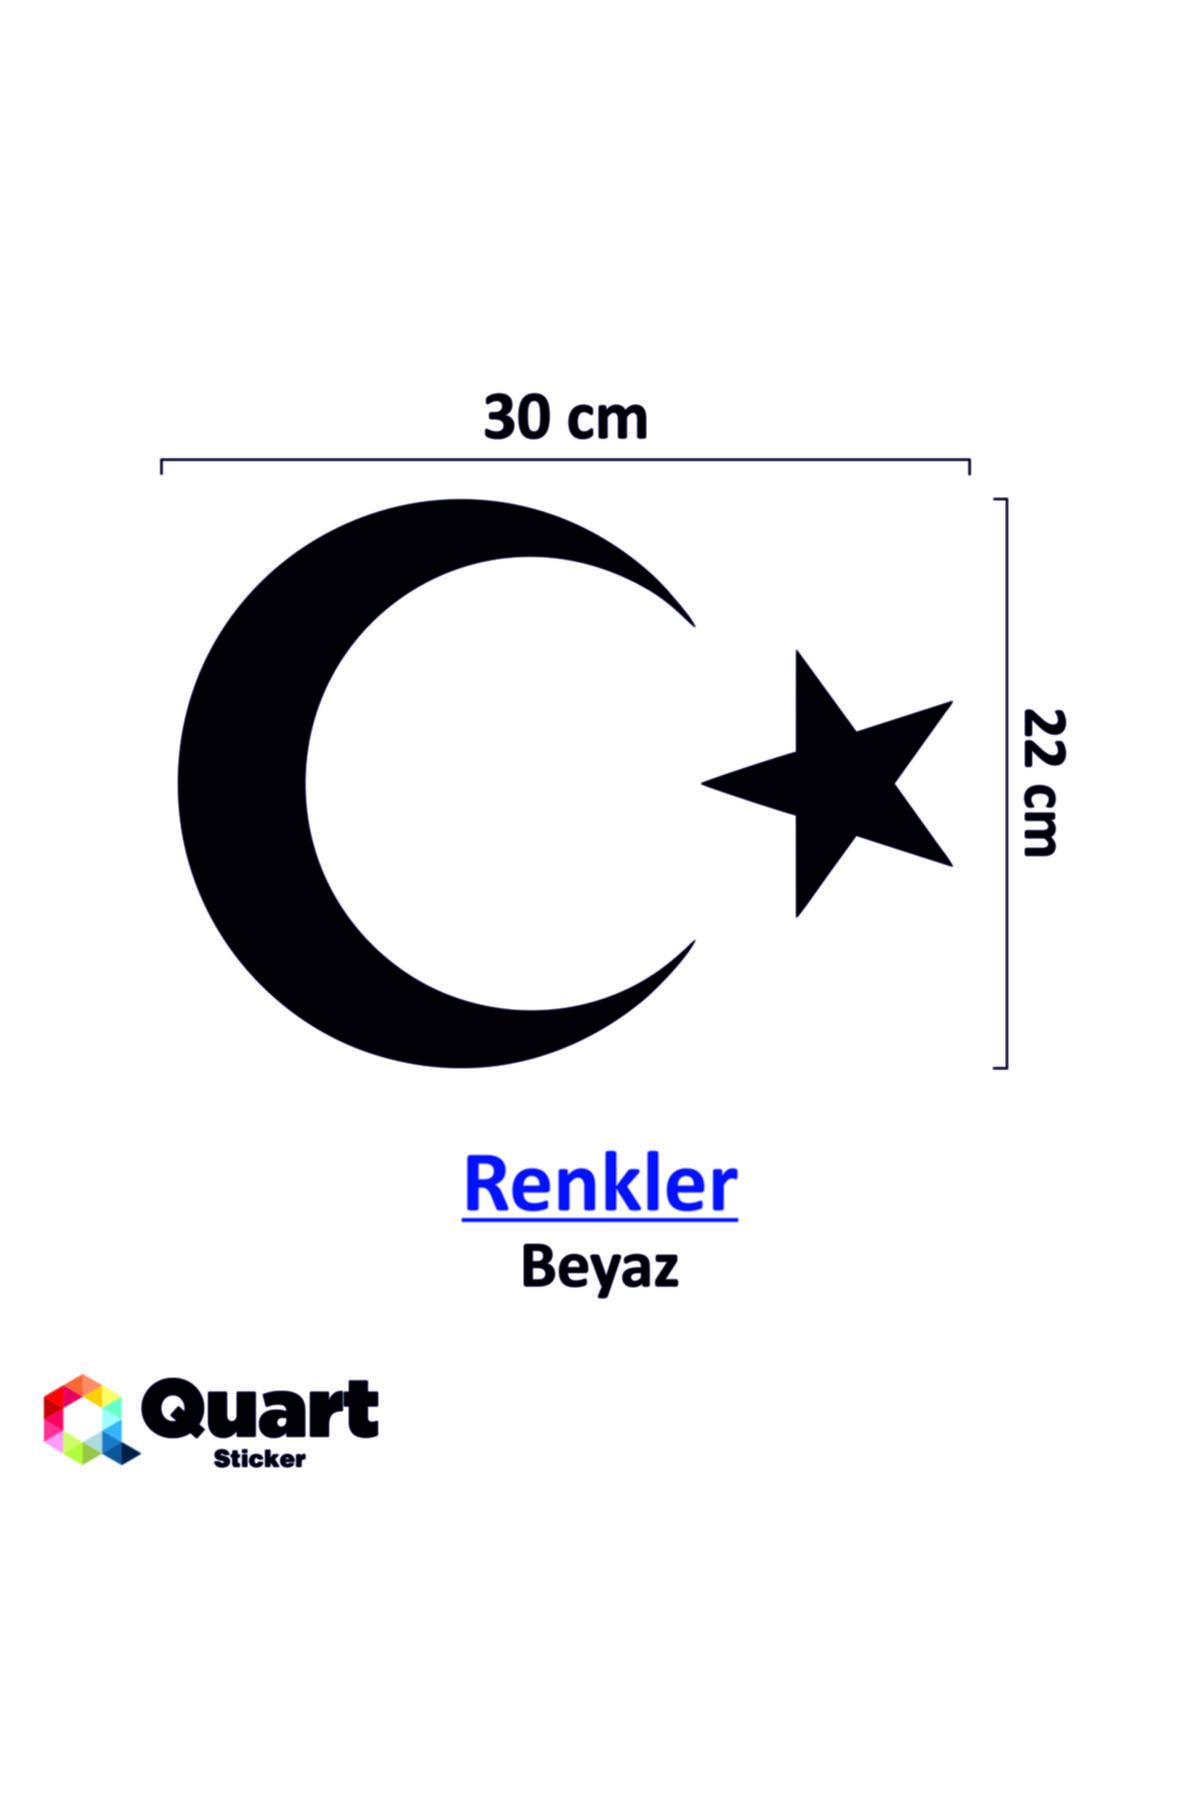 Quart Aksesuar 30 Cm Beyaz Ay Yıldız Sticker Türk Bayrağı Sticker 2